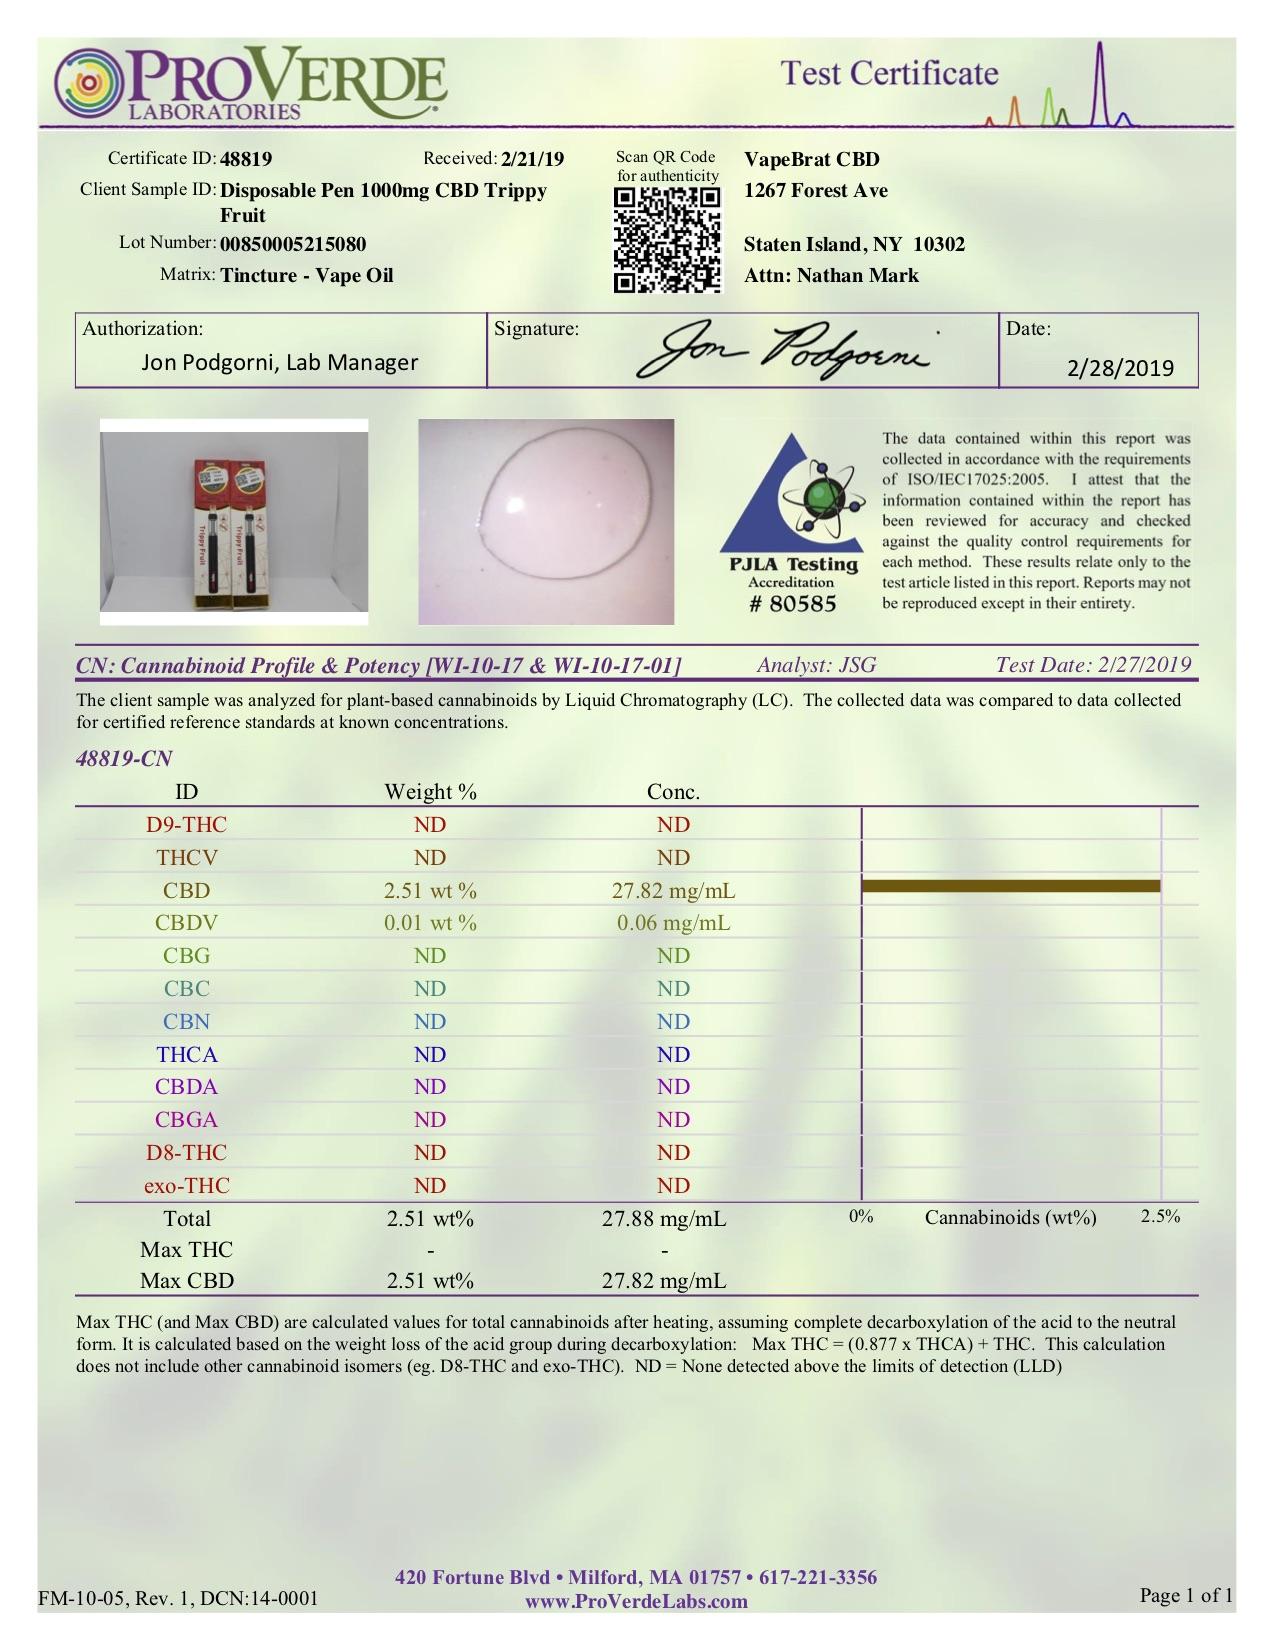 48819-cn-disposable-pen-1000mg-cbd-trippy-fruit.jpg